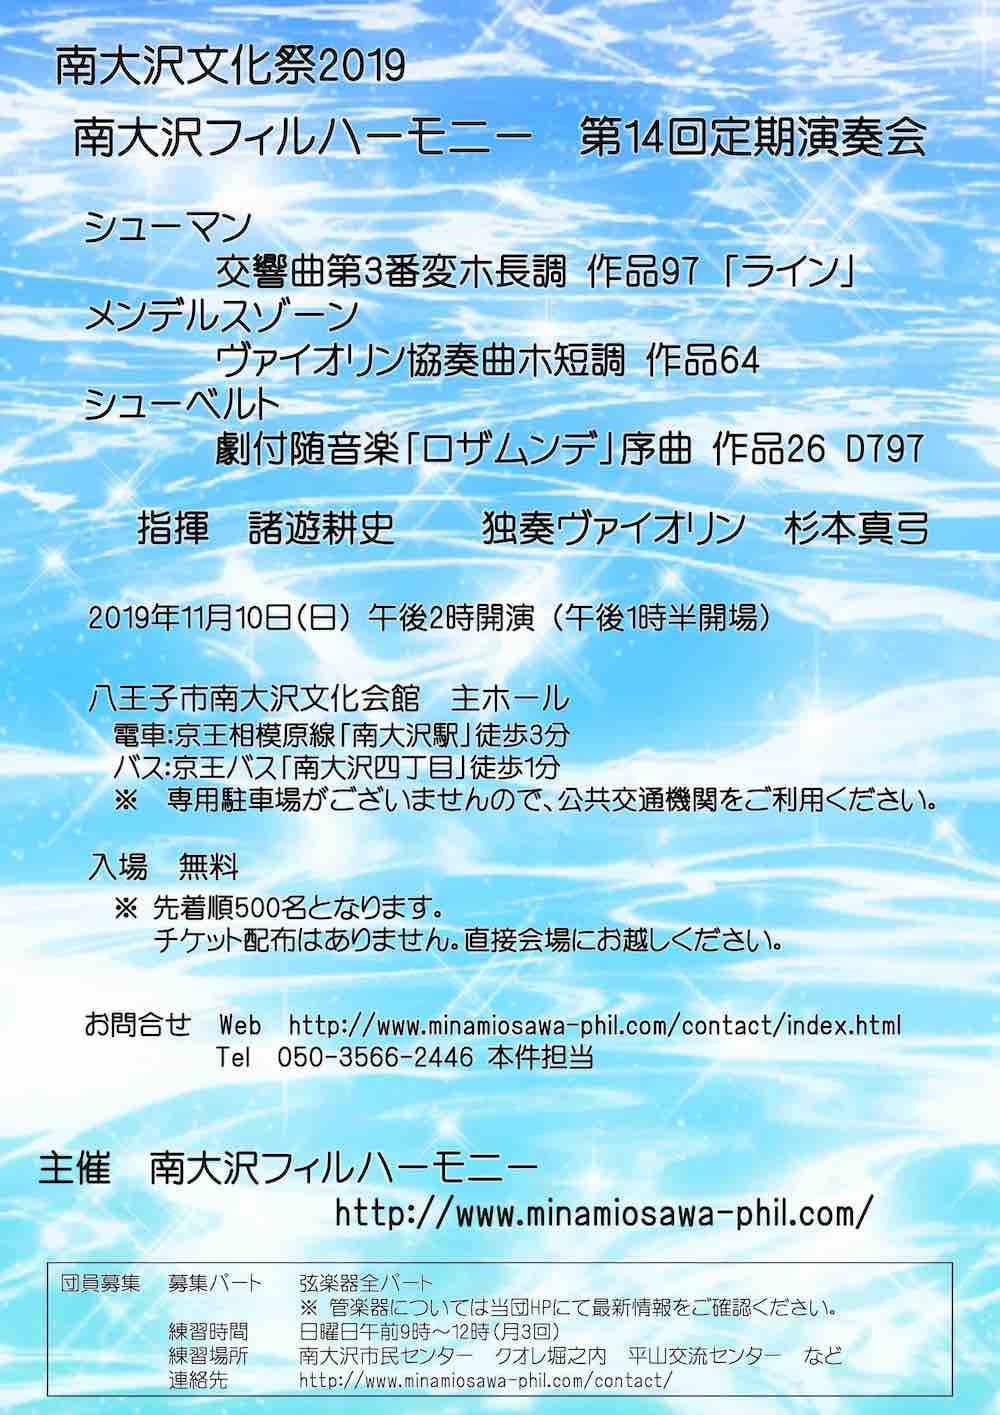 南大沢フィル第14回定期演奏会_最終版2(電番あり)4.jpg